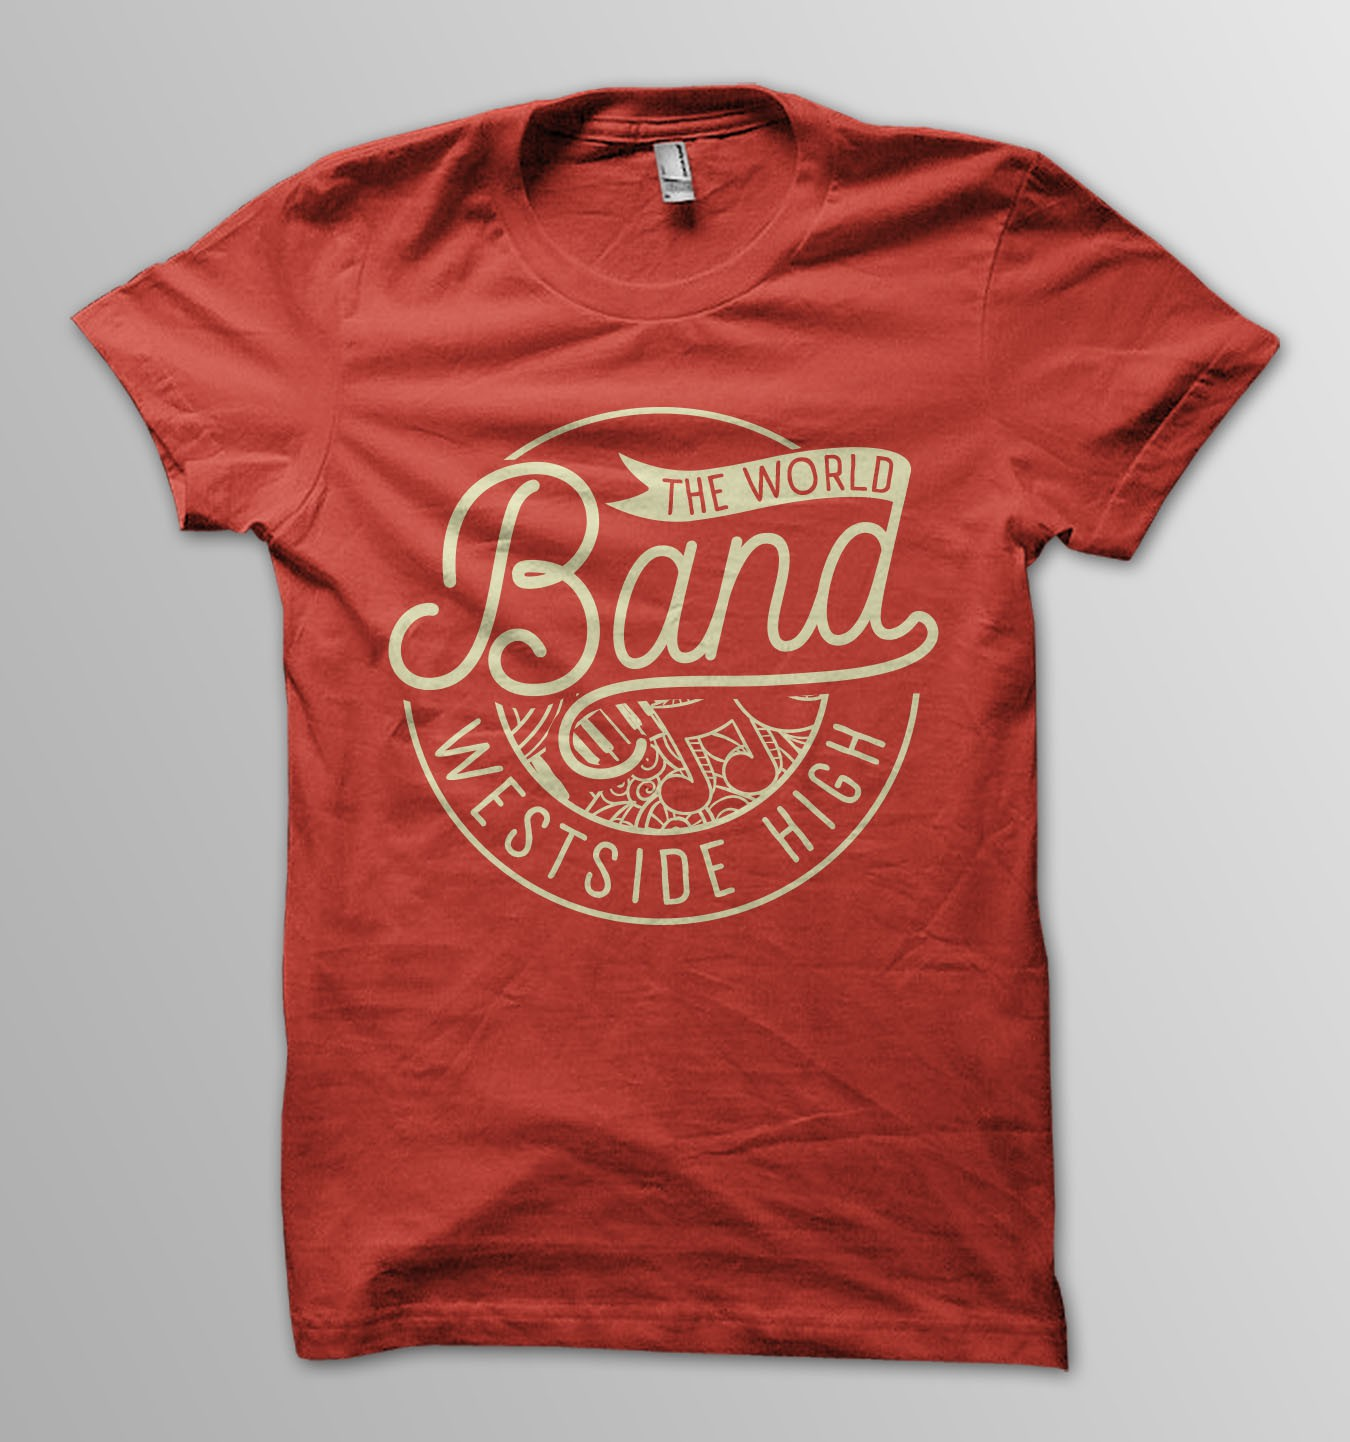 High School Marching Band T-shirt for www.imagemarket.com